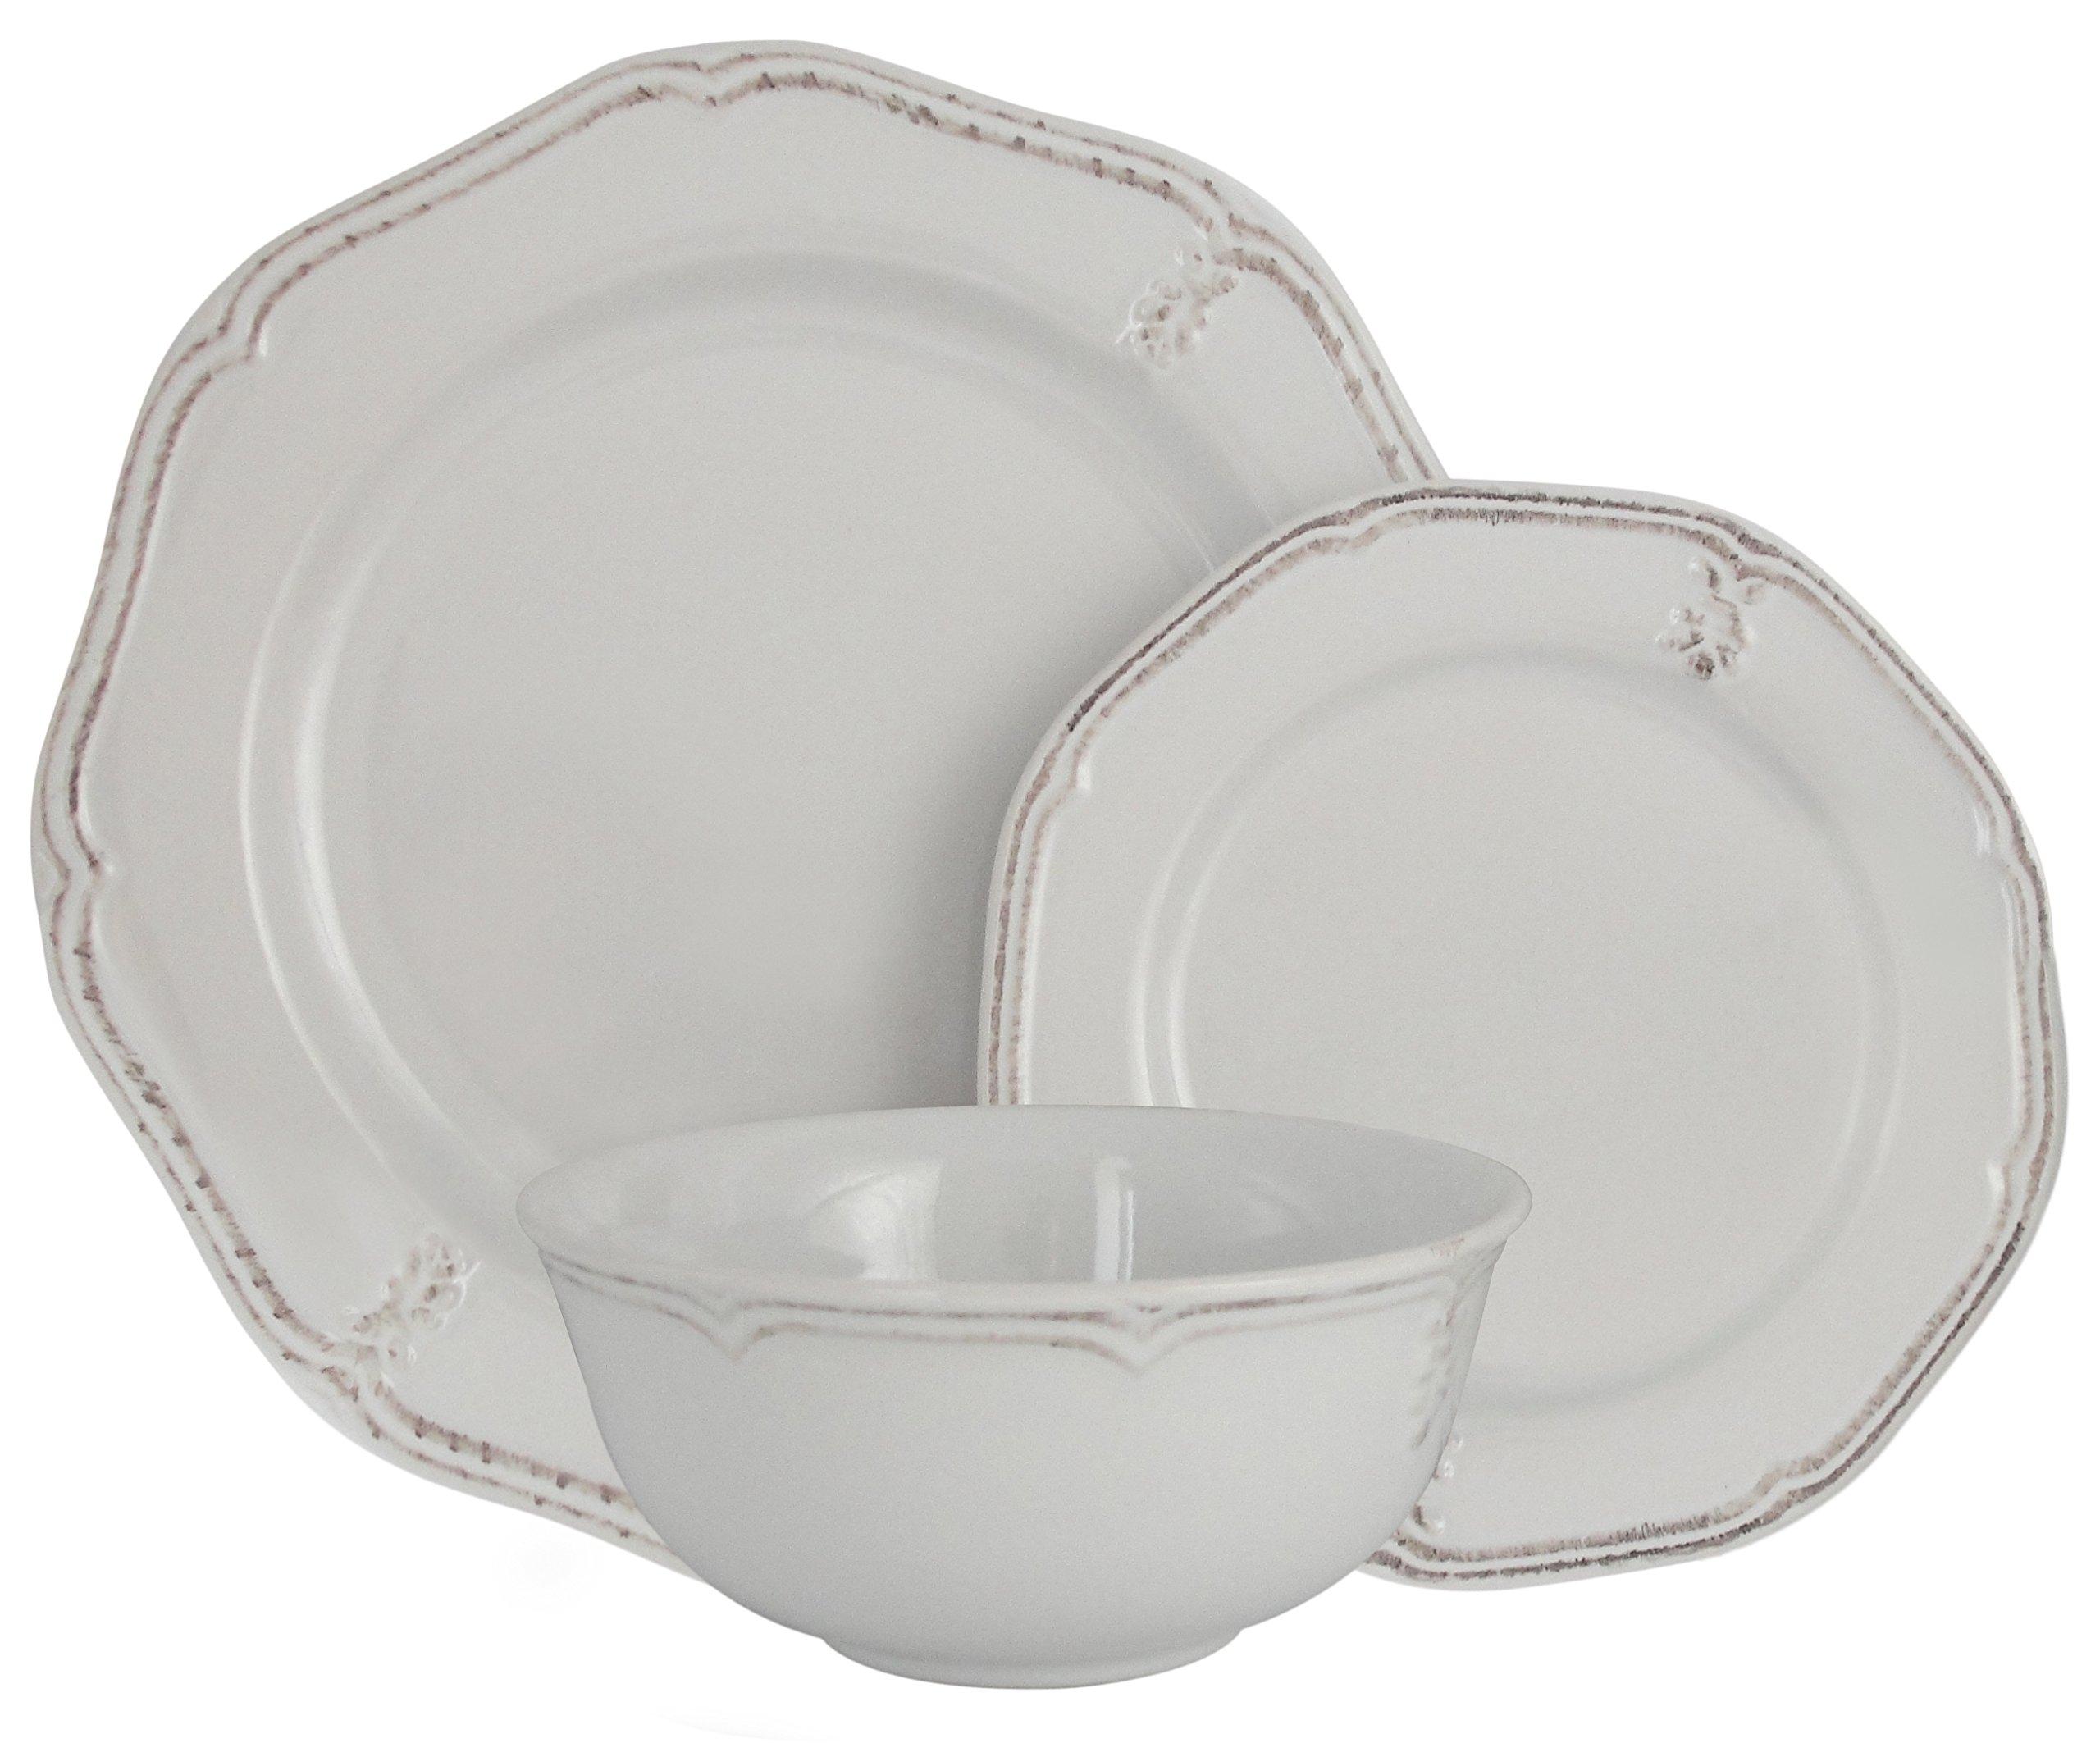 Melange Stoneware 36-Piece Dinnerware Set (Antique White) | Service for 6| Microwave, Dishwasher & Oven Safe | Dinner Plate, Salad Plate & Soup Bowl (12 Each)